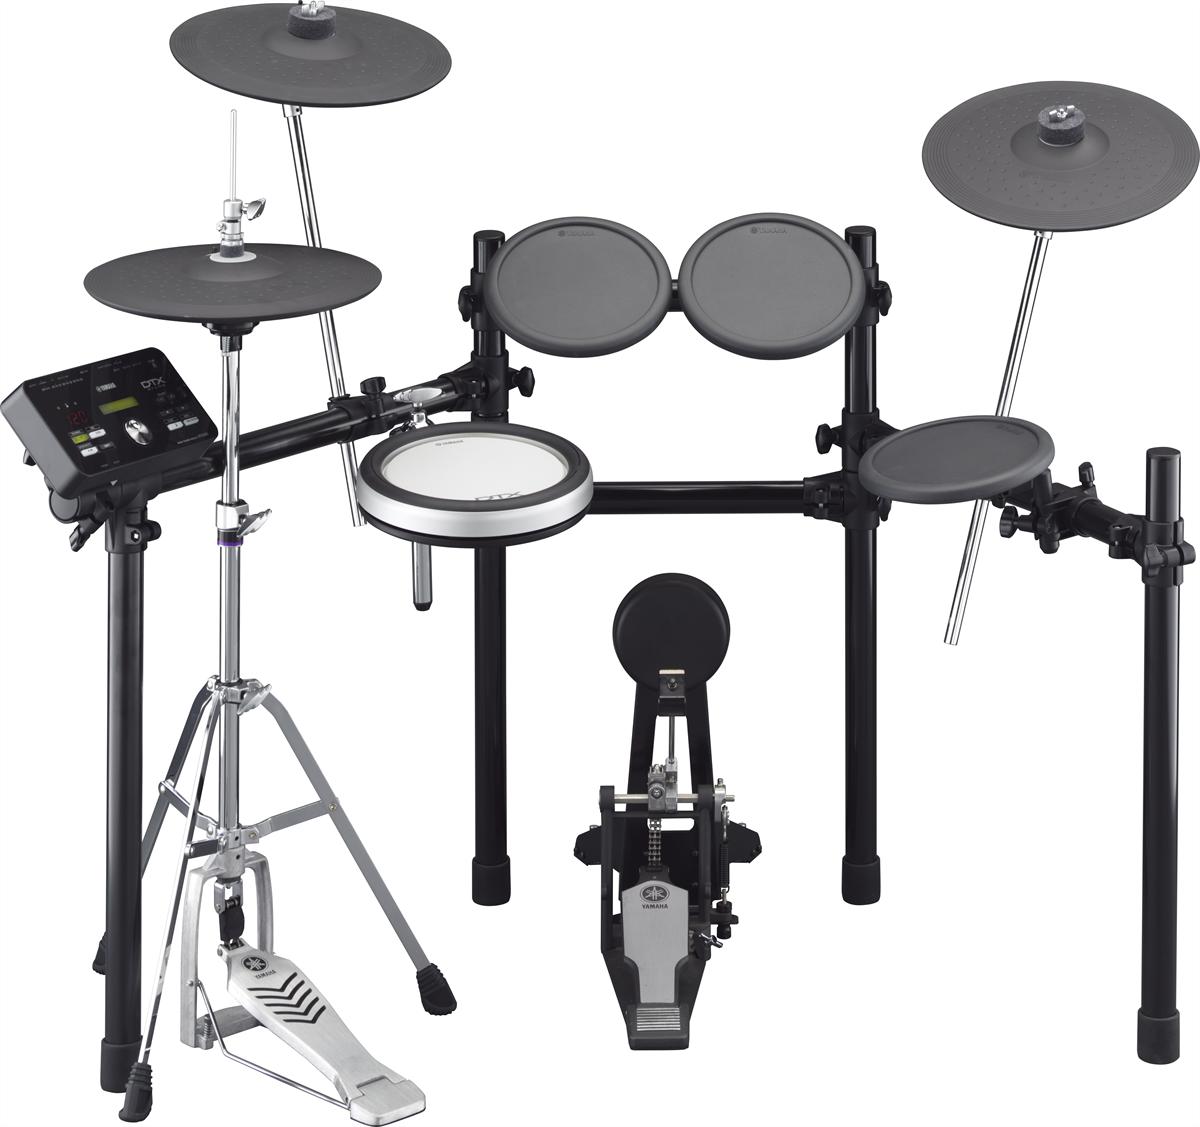 DTX532K Yamaha Complete E-Drum Set